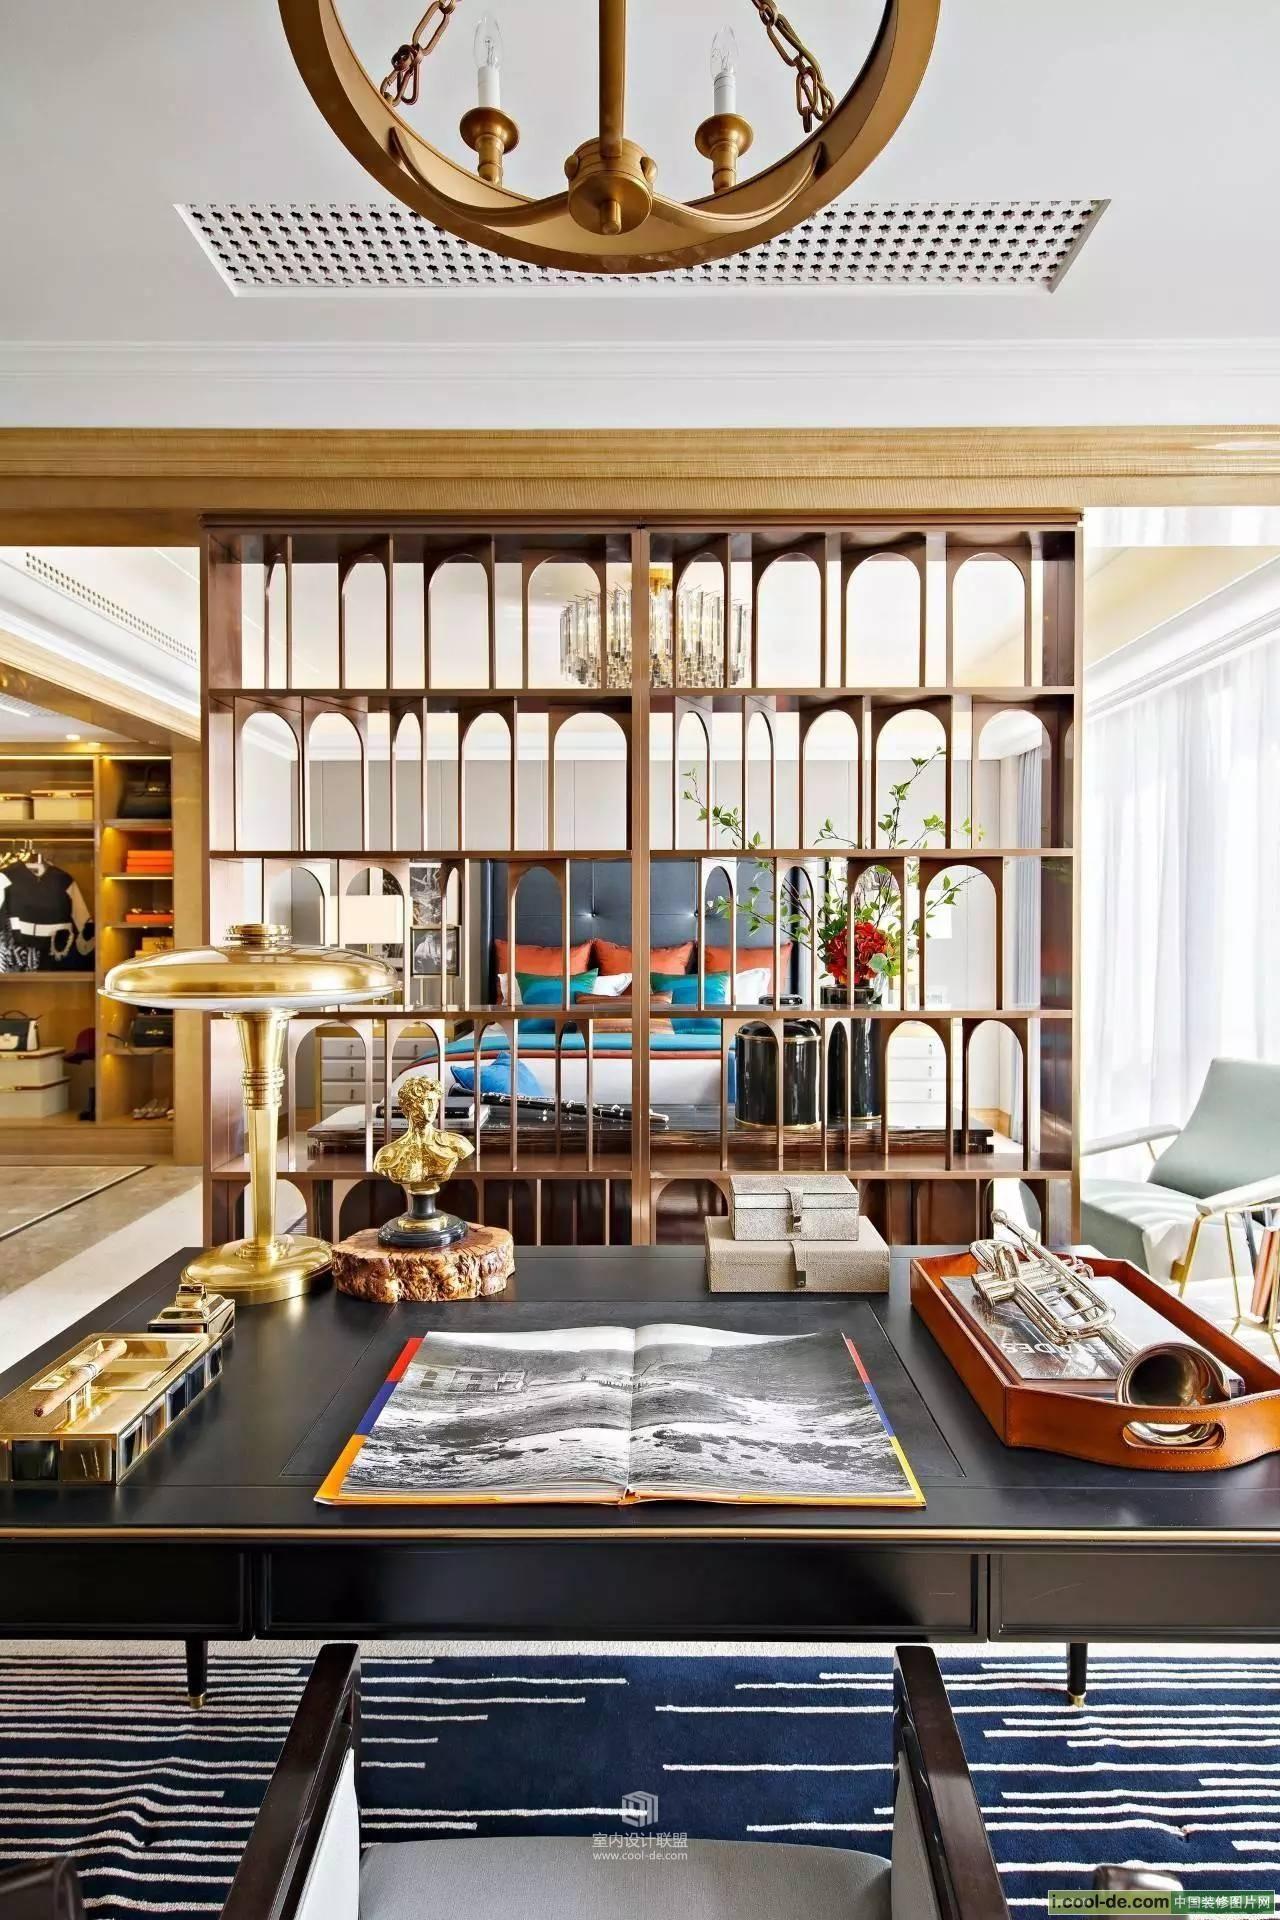 Study Room Interior Design: Pin By YA HUA On Stuff To Buy In 2019